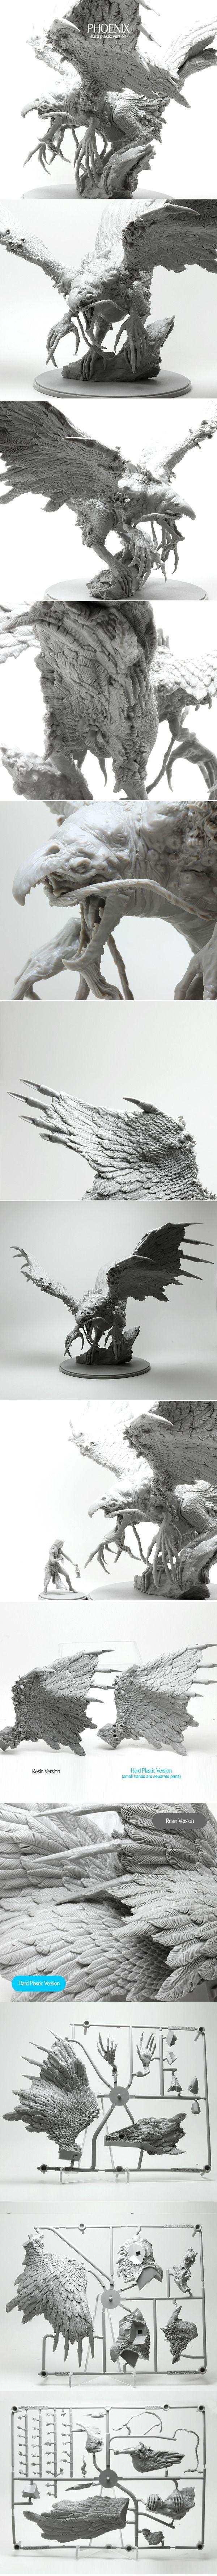 https://www.kickstarter.com/projects/poots/kingdom-death-monster  Kingdom Death - The Phoenix